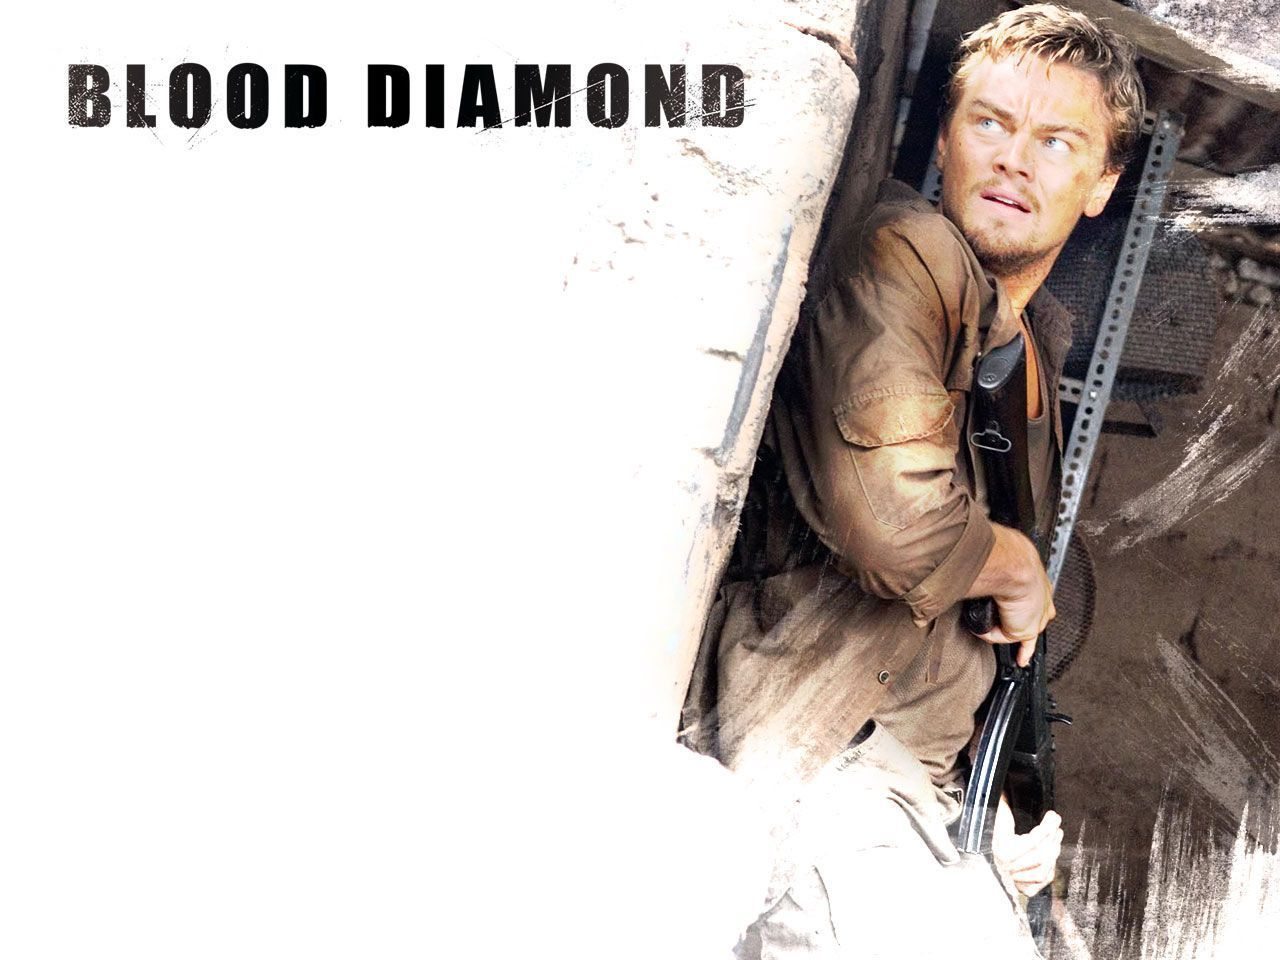 Blood Diamond - Leonardo DiCaprio Photo (8607515) - Fanpop